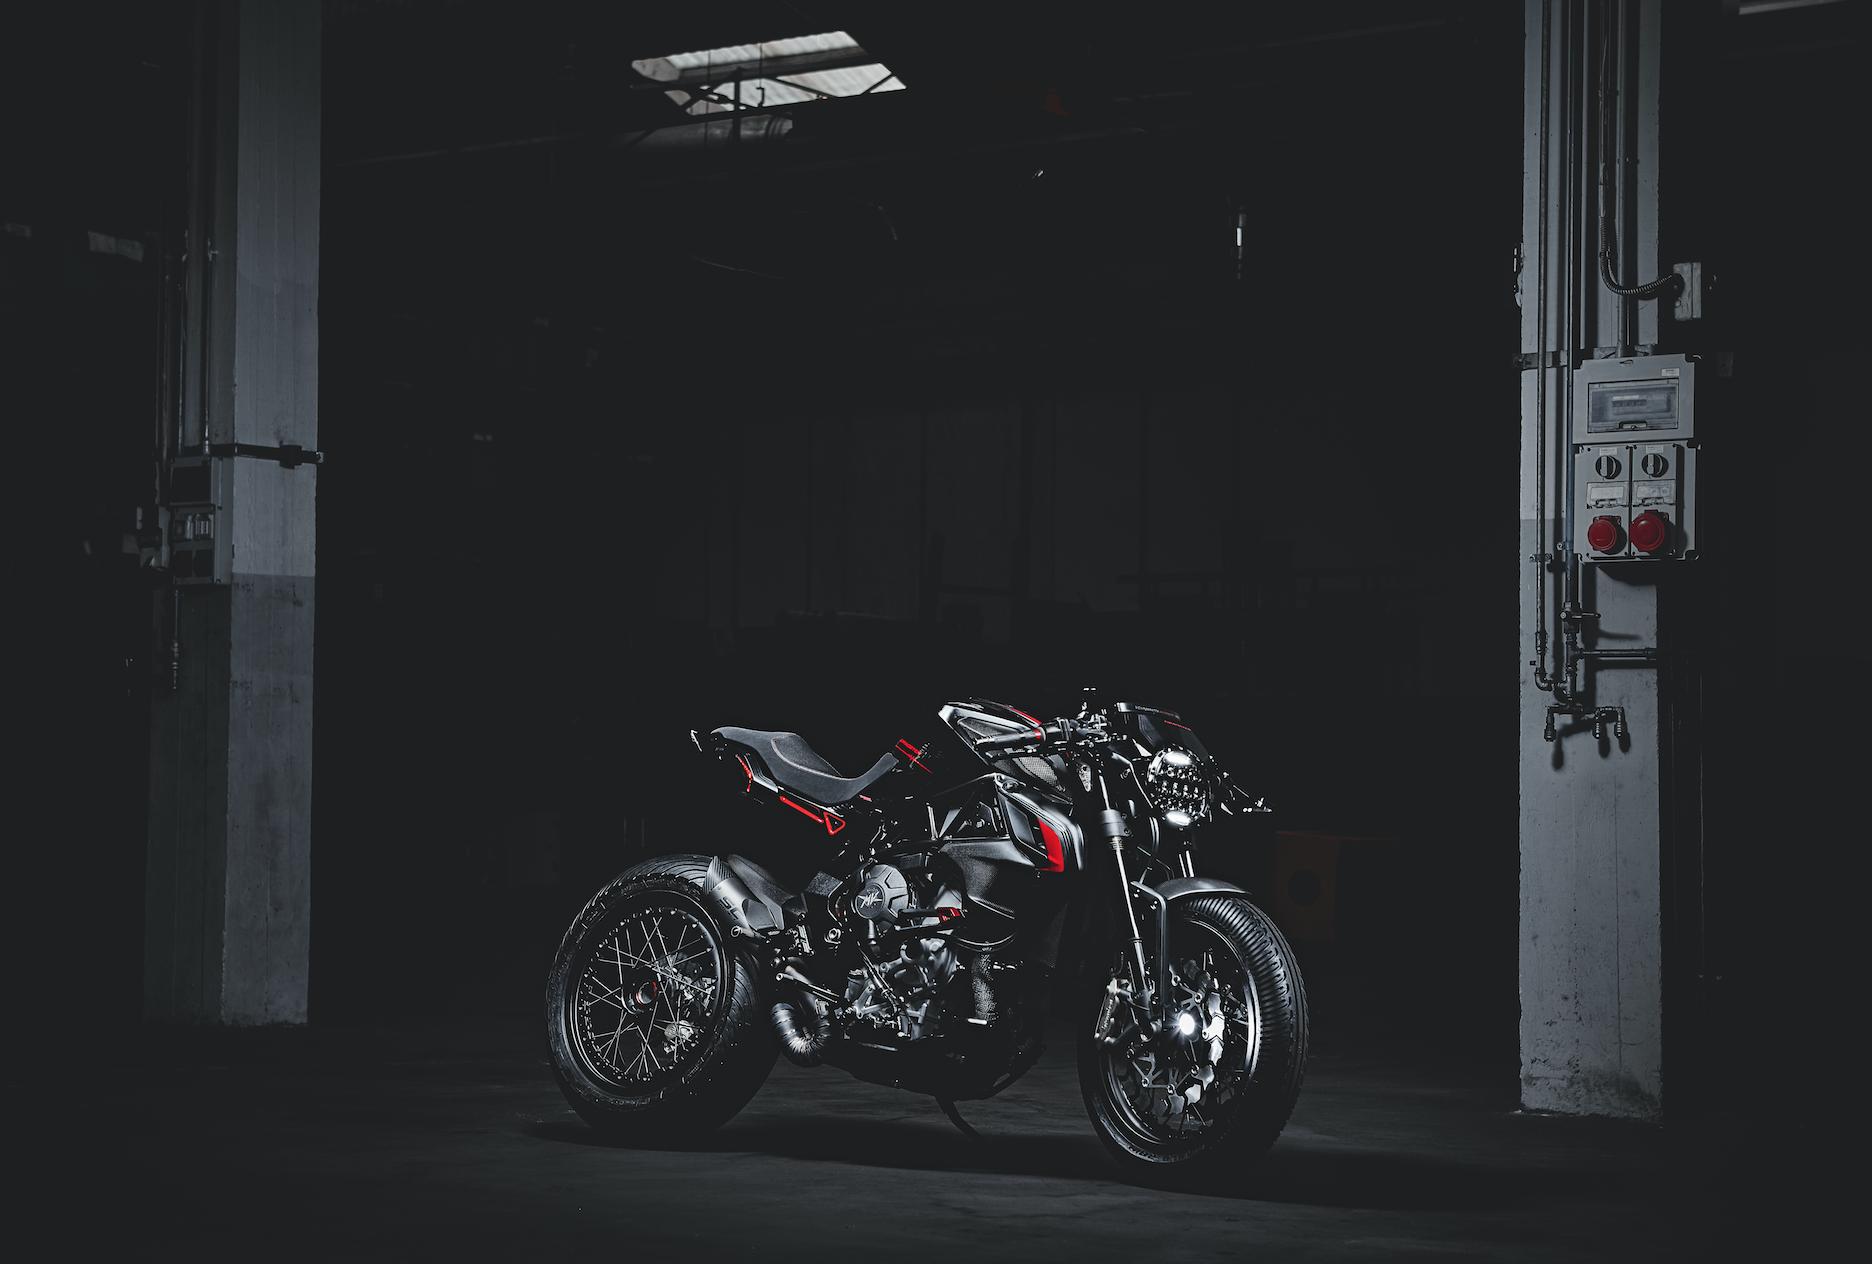 MV Agusta al Motor Bike Expo con due special estreme